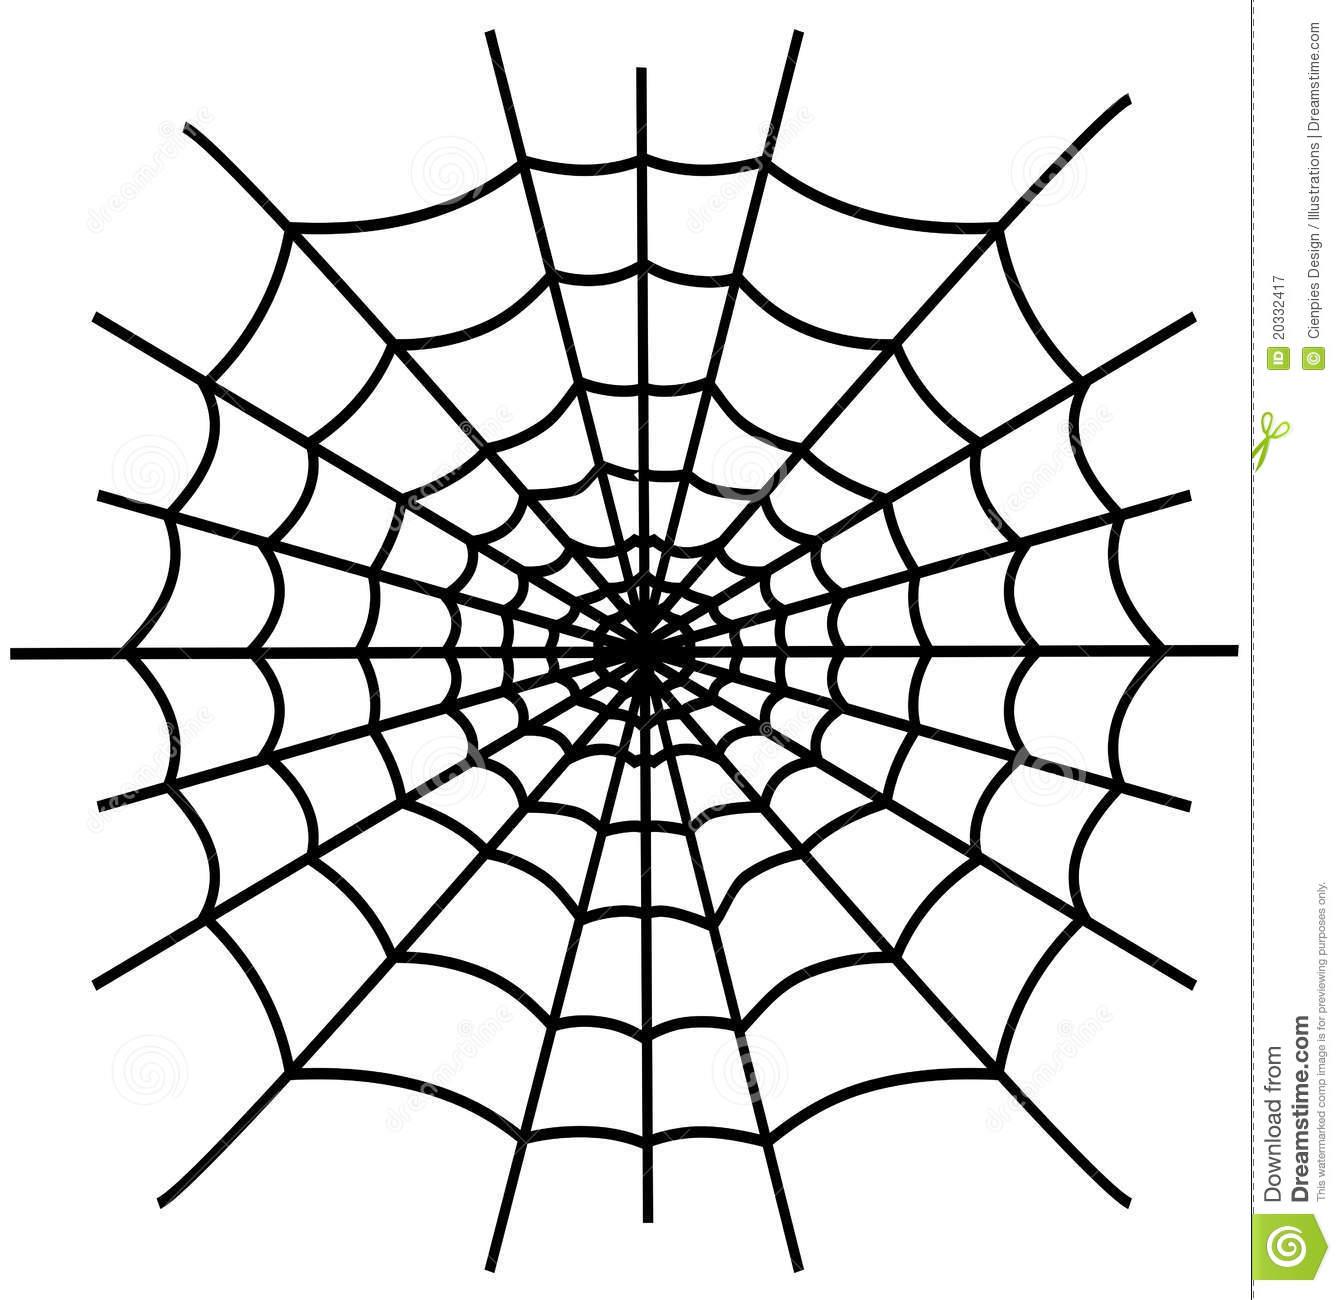 Free Cartoon Spider Web, Download Free Clip Art, Free Clip